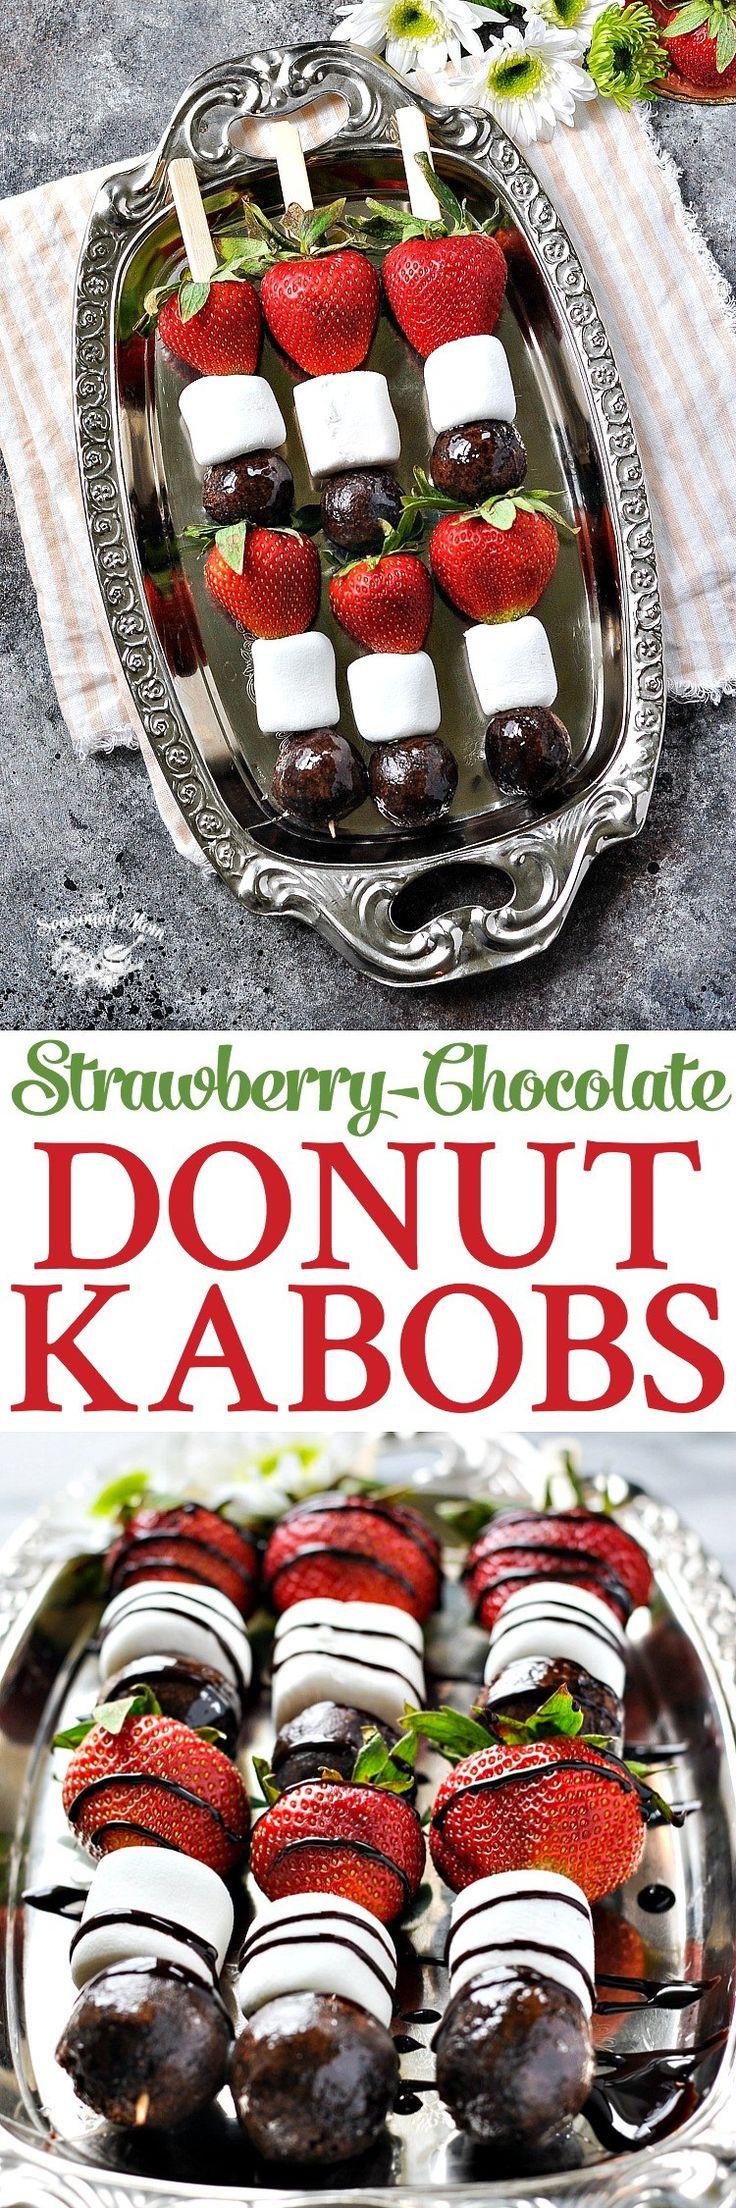 unique bridal shower appetizers%0A Strawberry Chocolate Donut Kabobs  Bridal Shower RecipesBridal